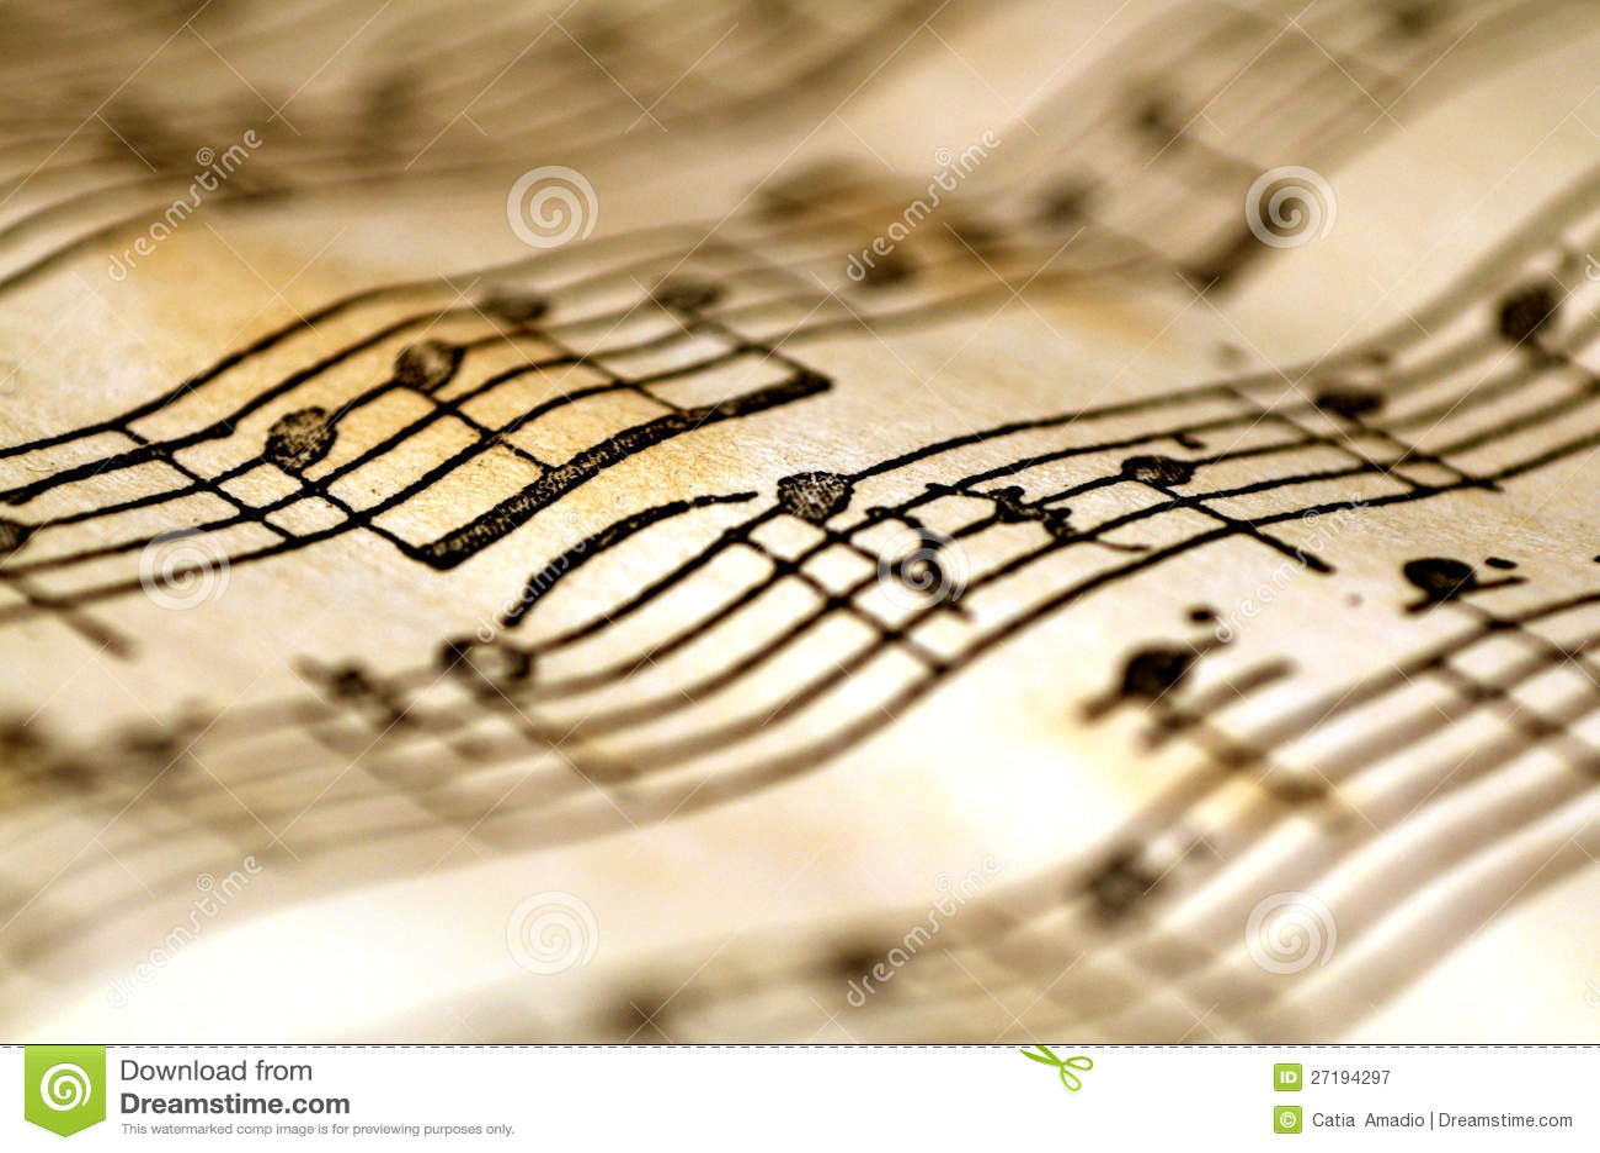 Wellenförmige Musikanmerkungen